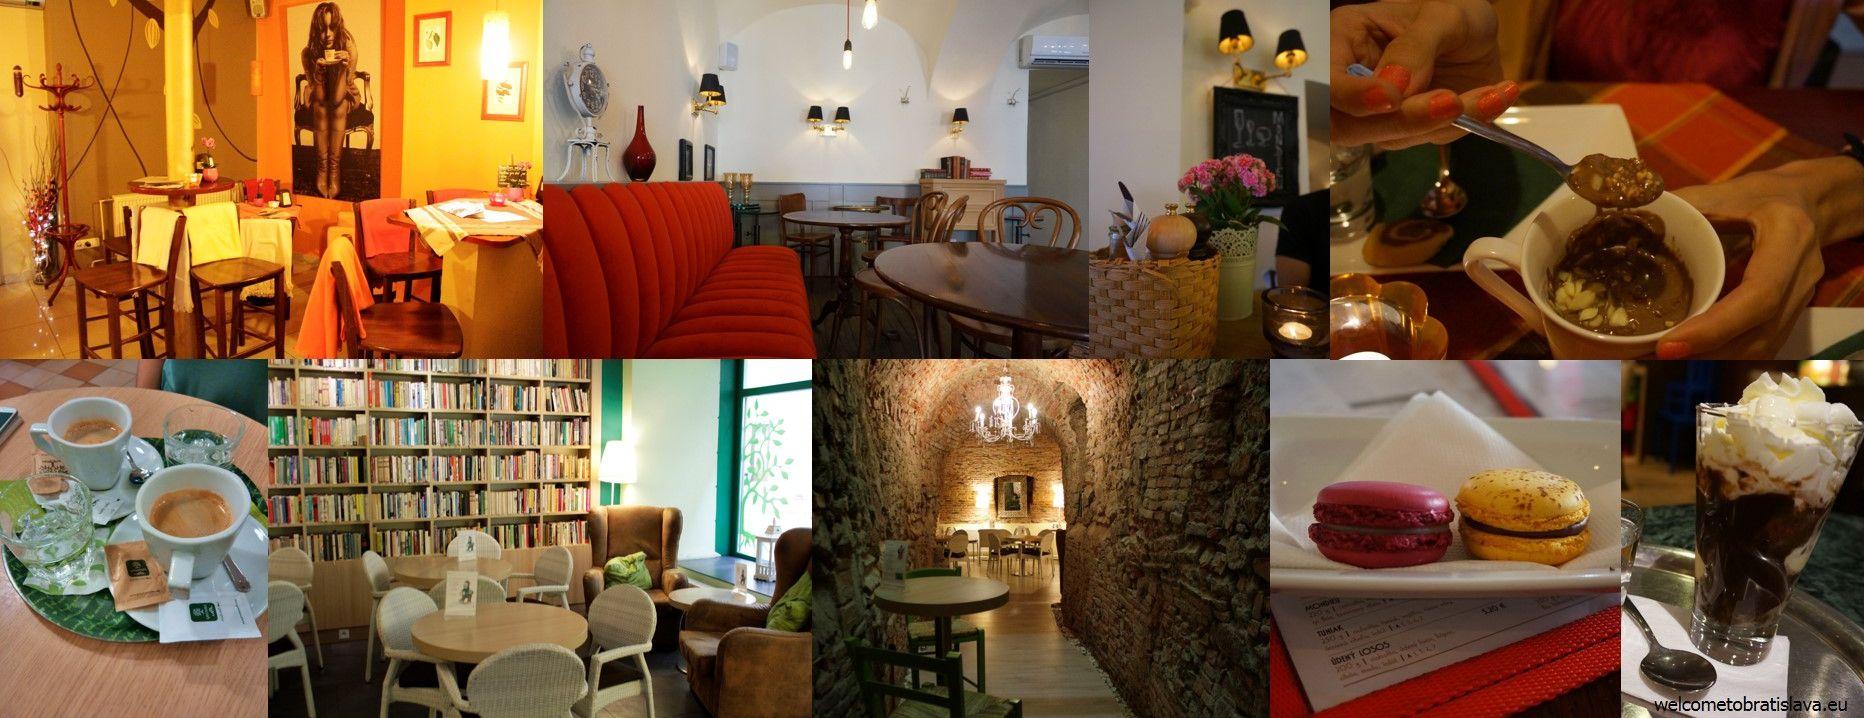 The classic cafes in Bratislava